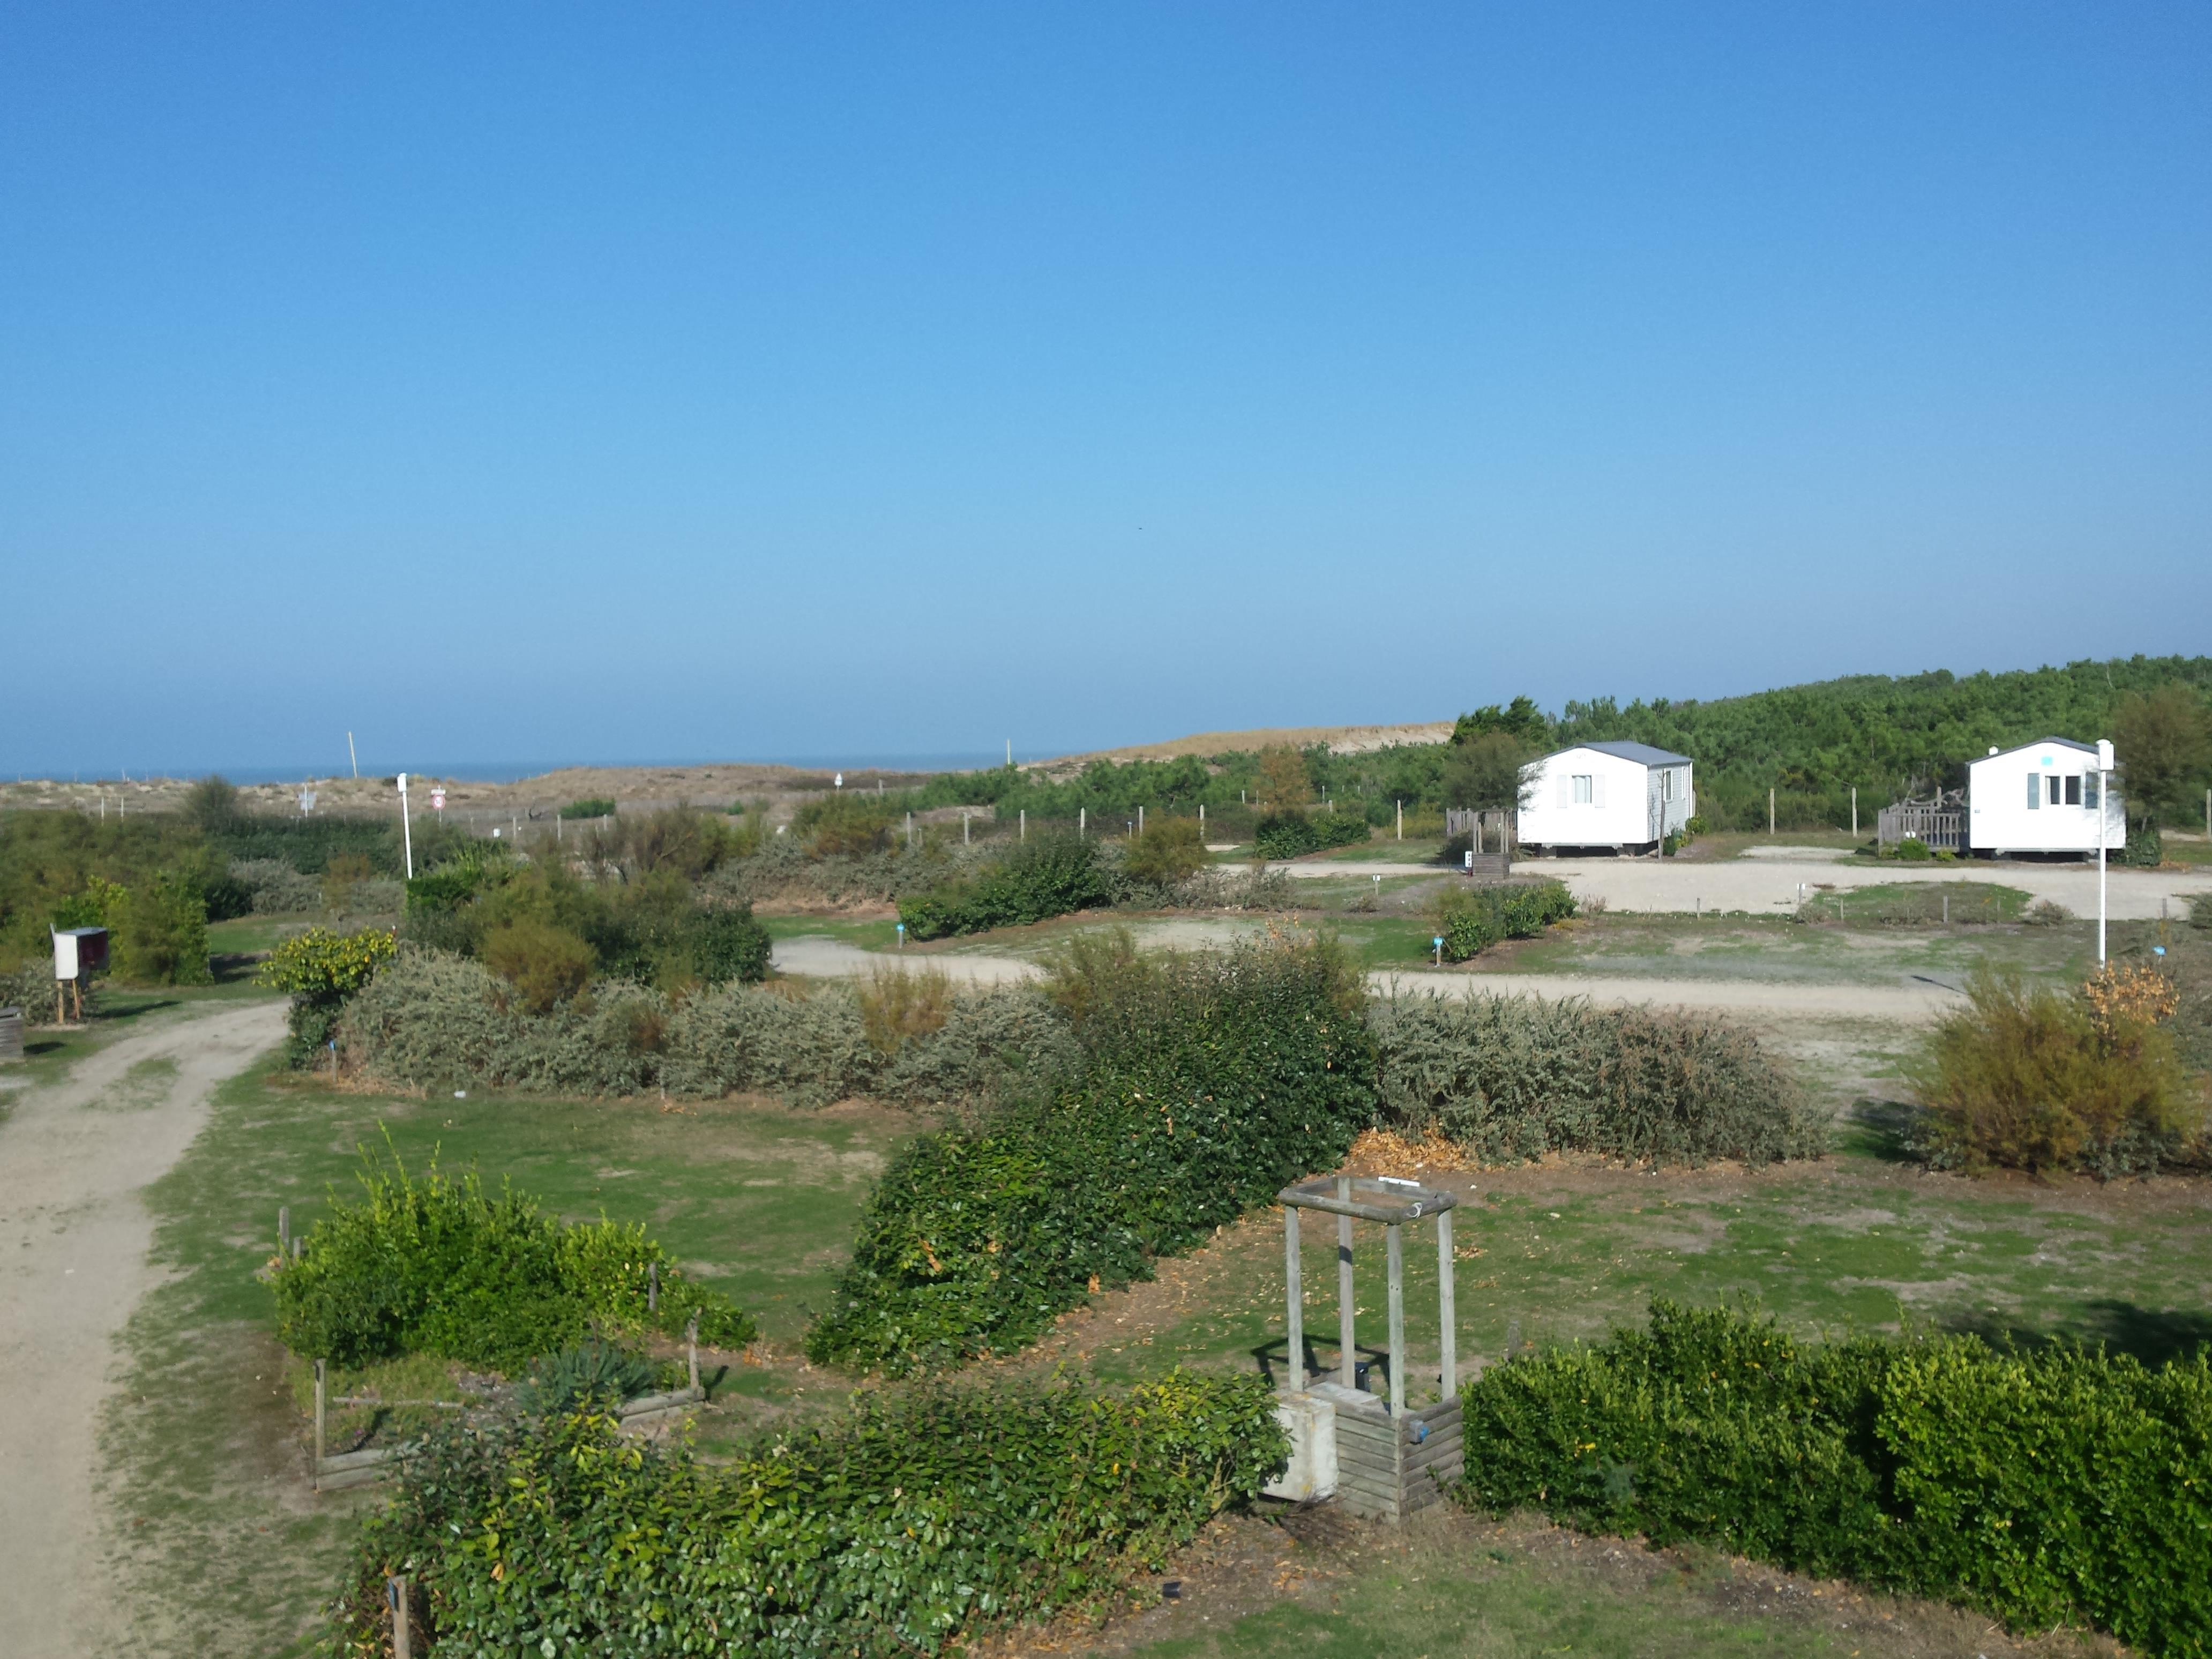 Camping le Soleil d'Or, Montalivet, Gironde